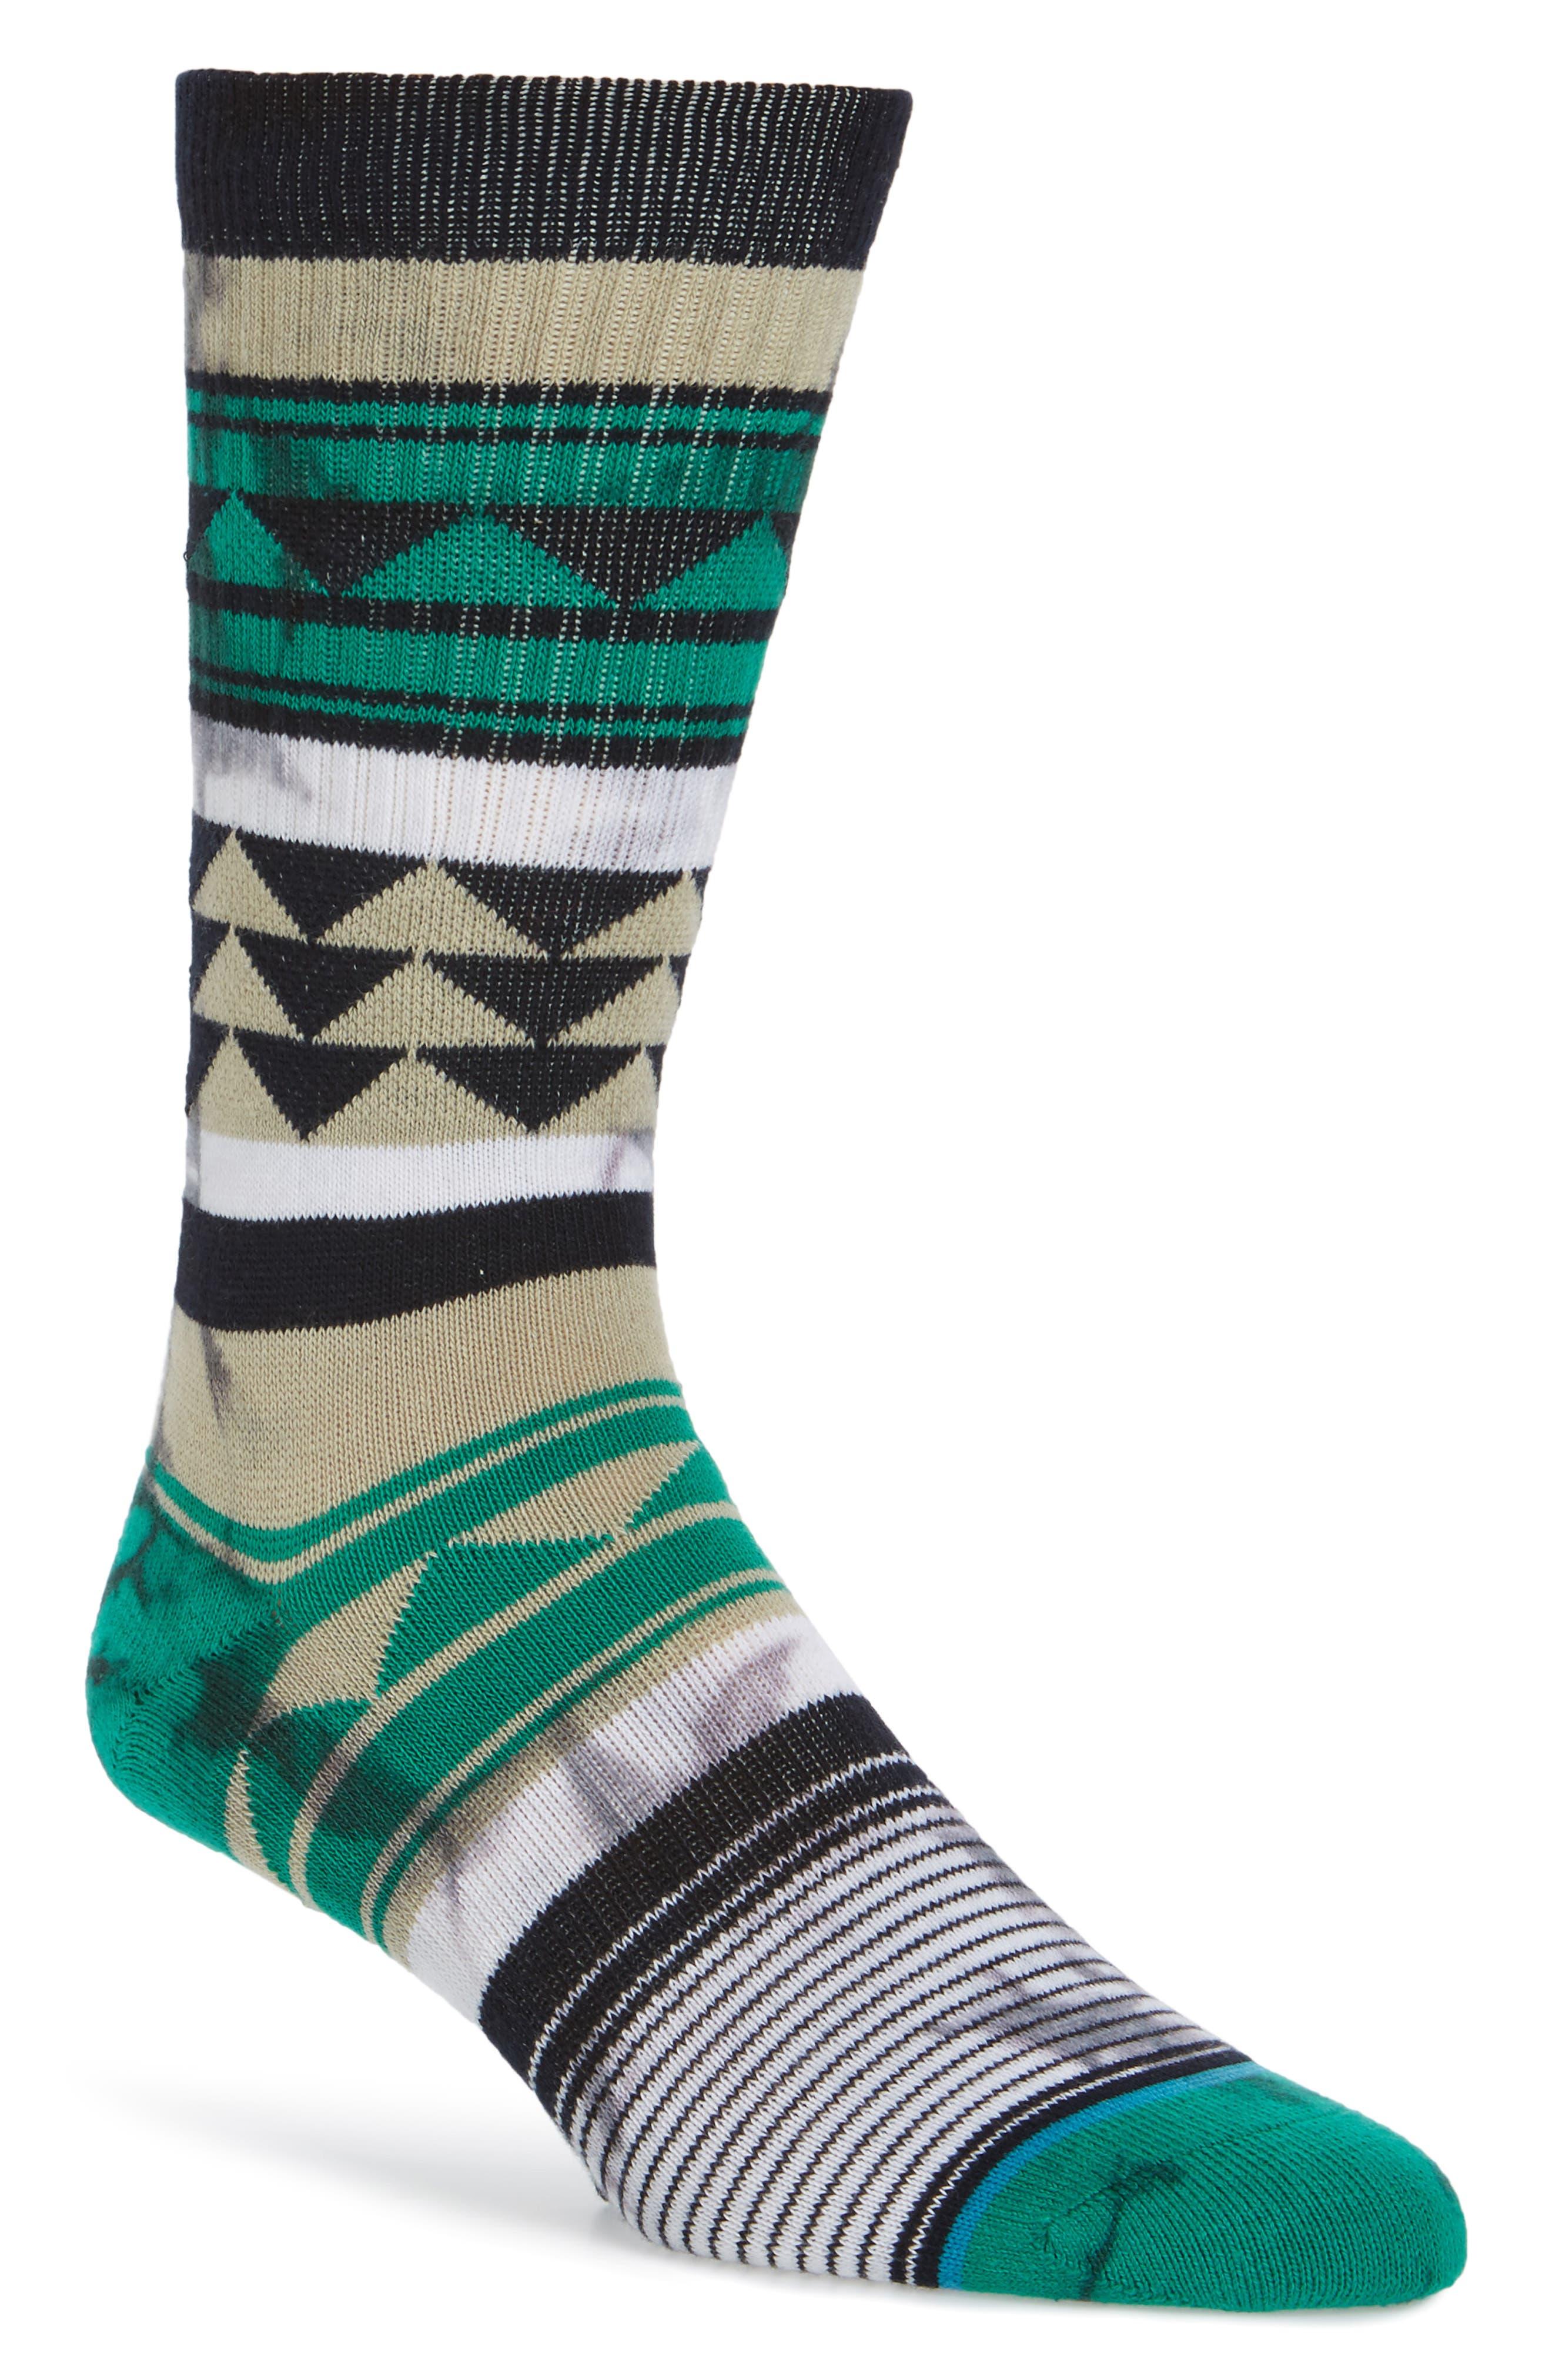 Alternate Image 1 Selected - Stance Pachuca Crew Socks